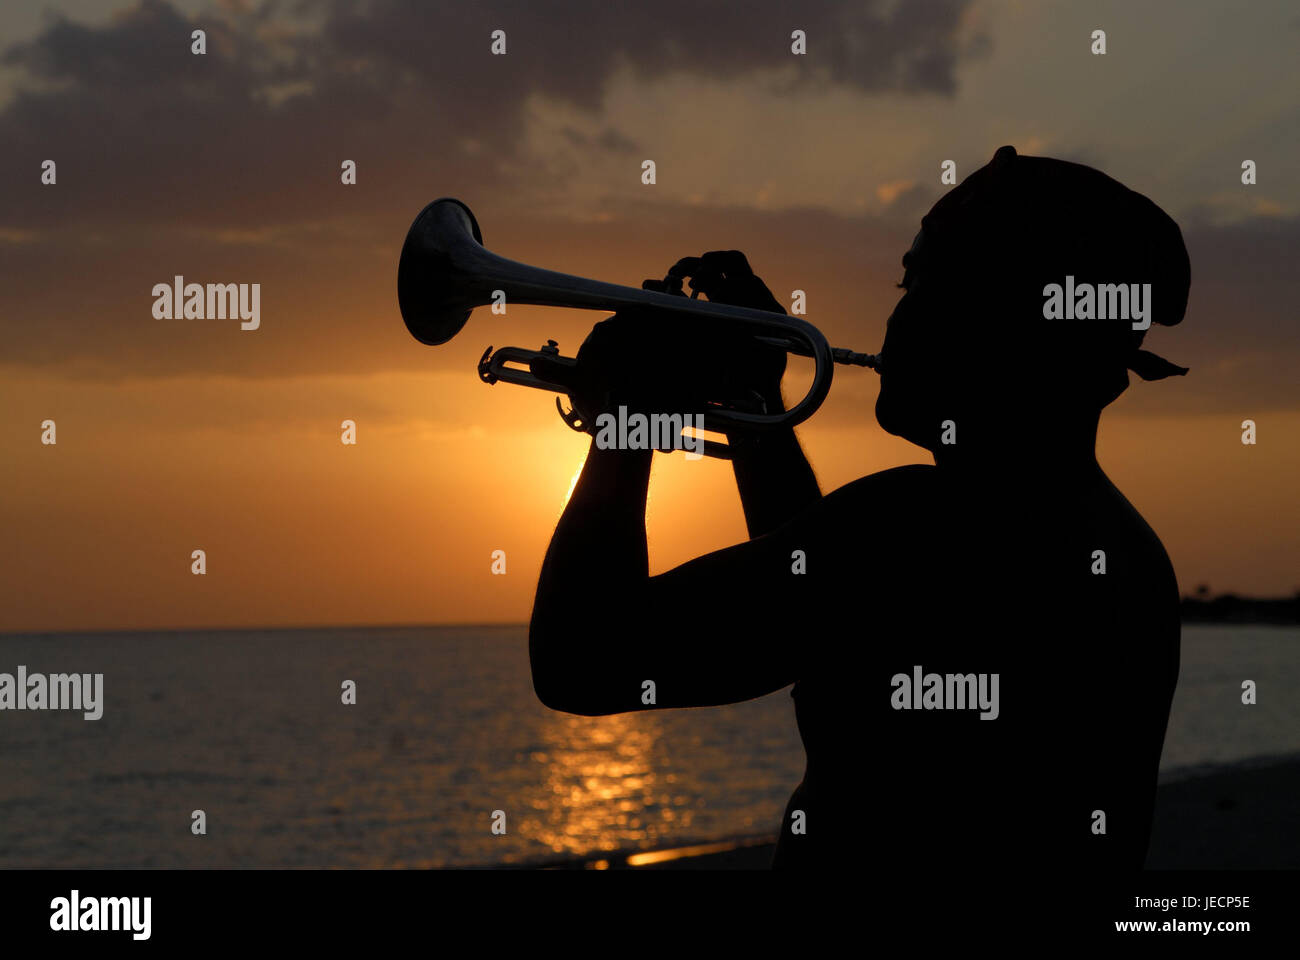 Cuba, Trinidad, beach, silhouette, trumpet player, sundown, the Caribbean, island, person, man, musical instrument, Stock Photo